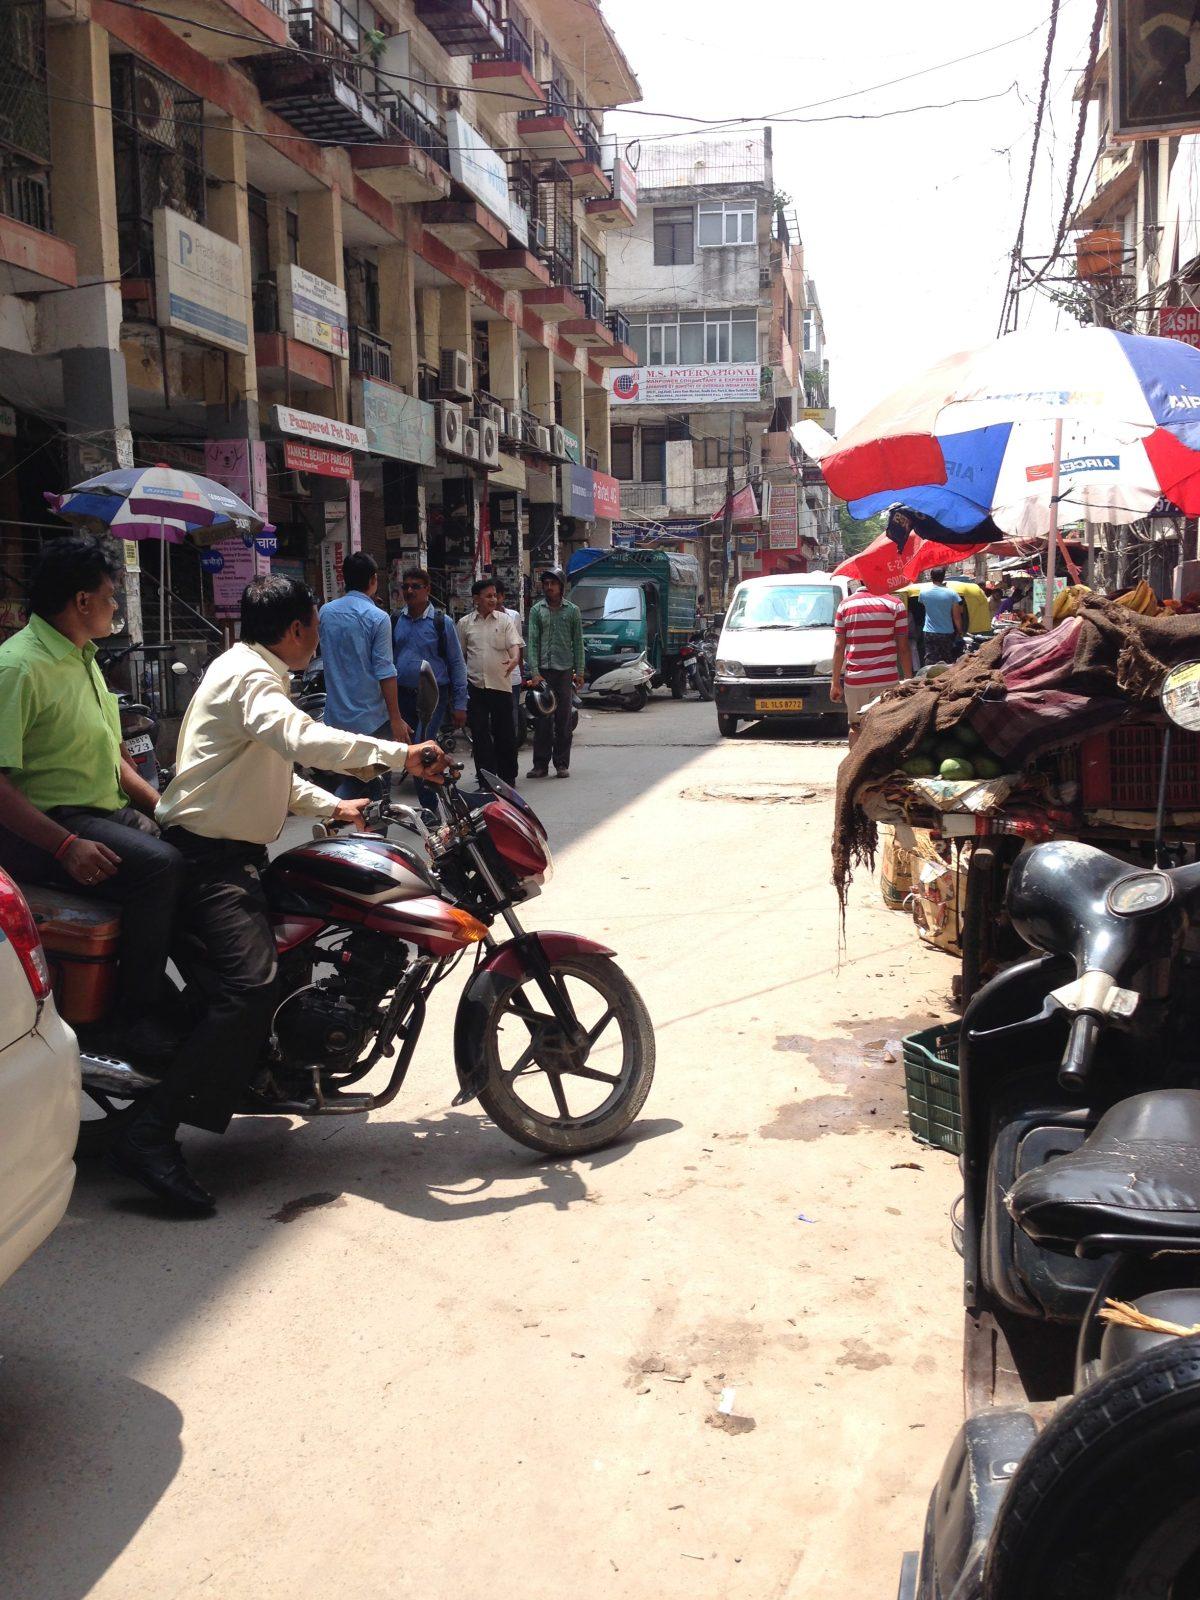 Delhi Taxi: Street Happenings at a Random Intersection